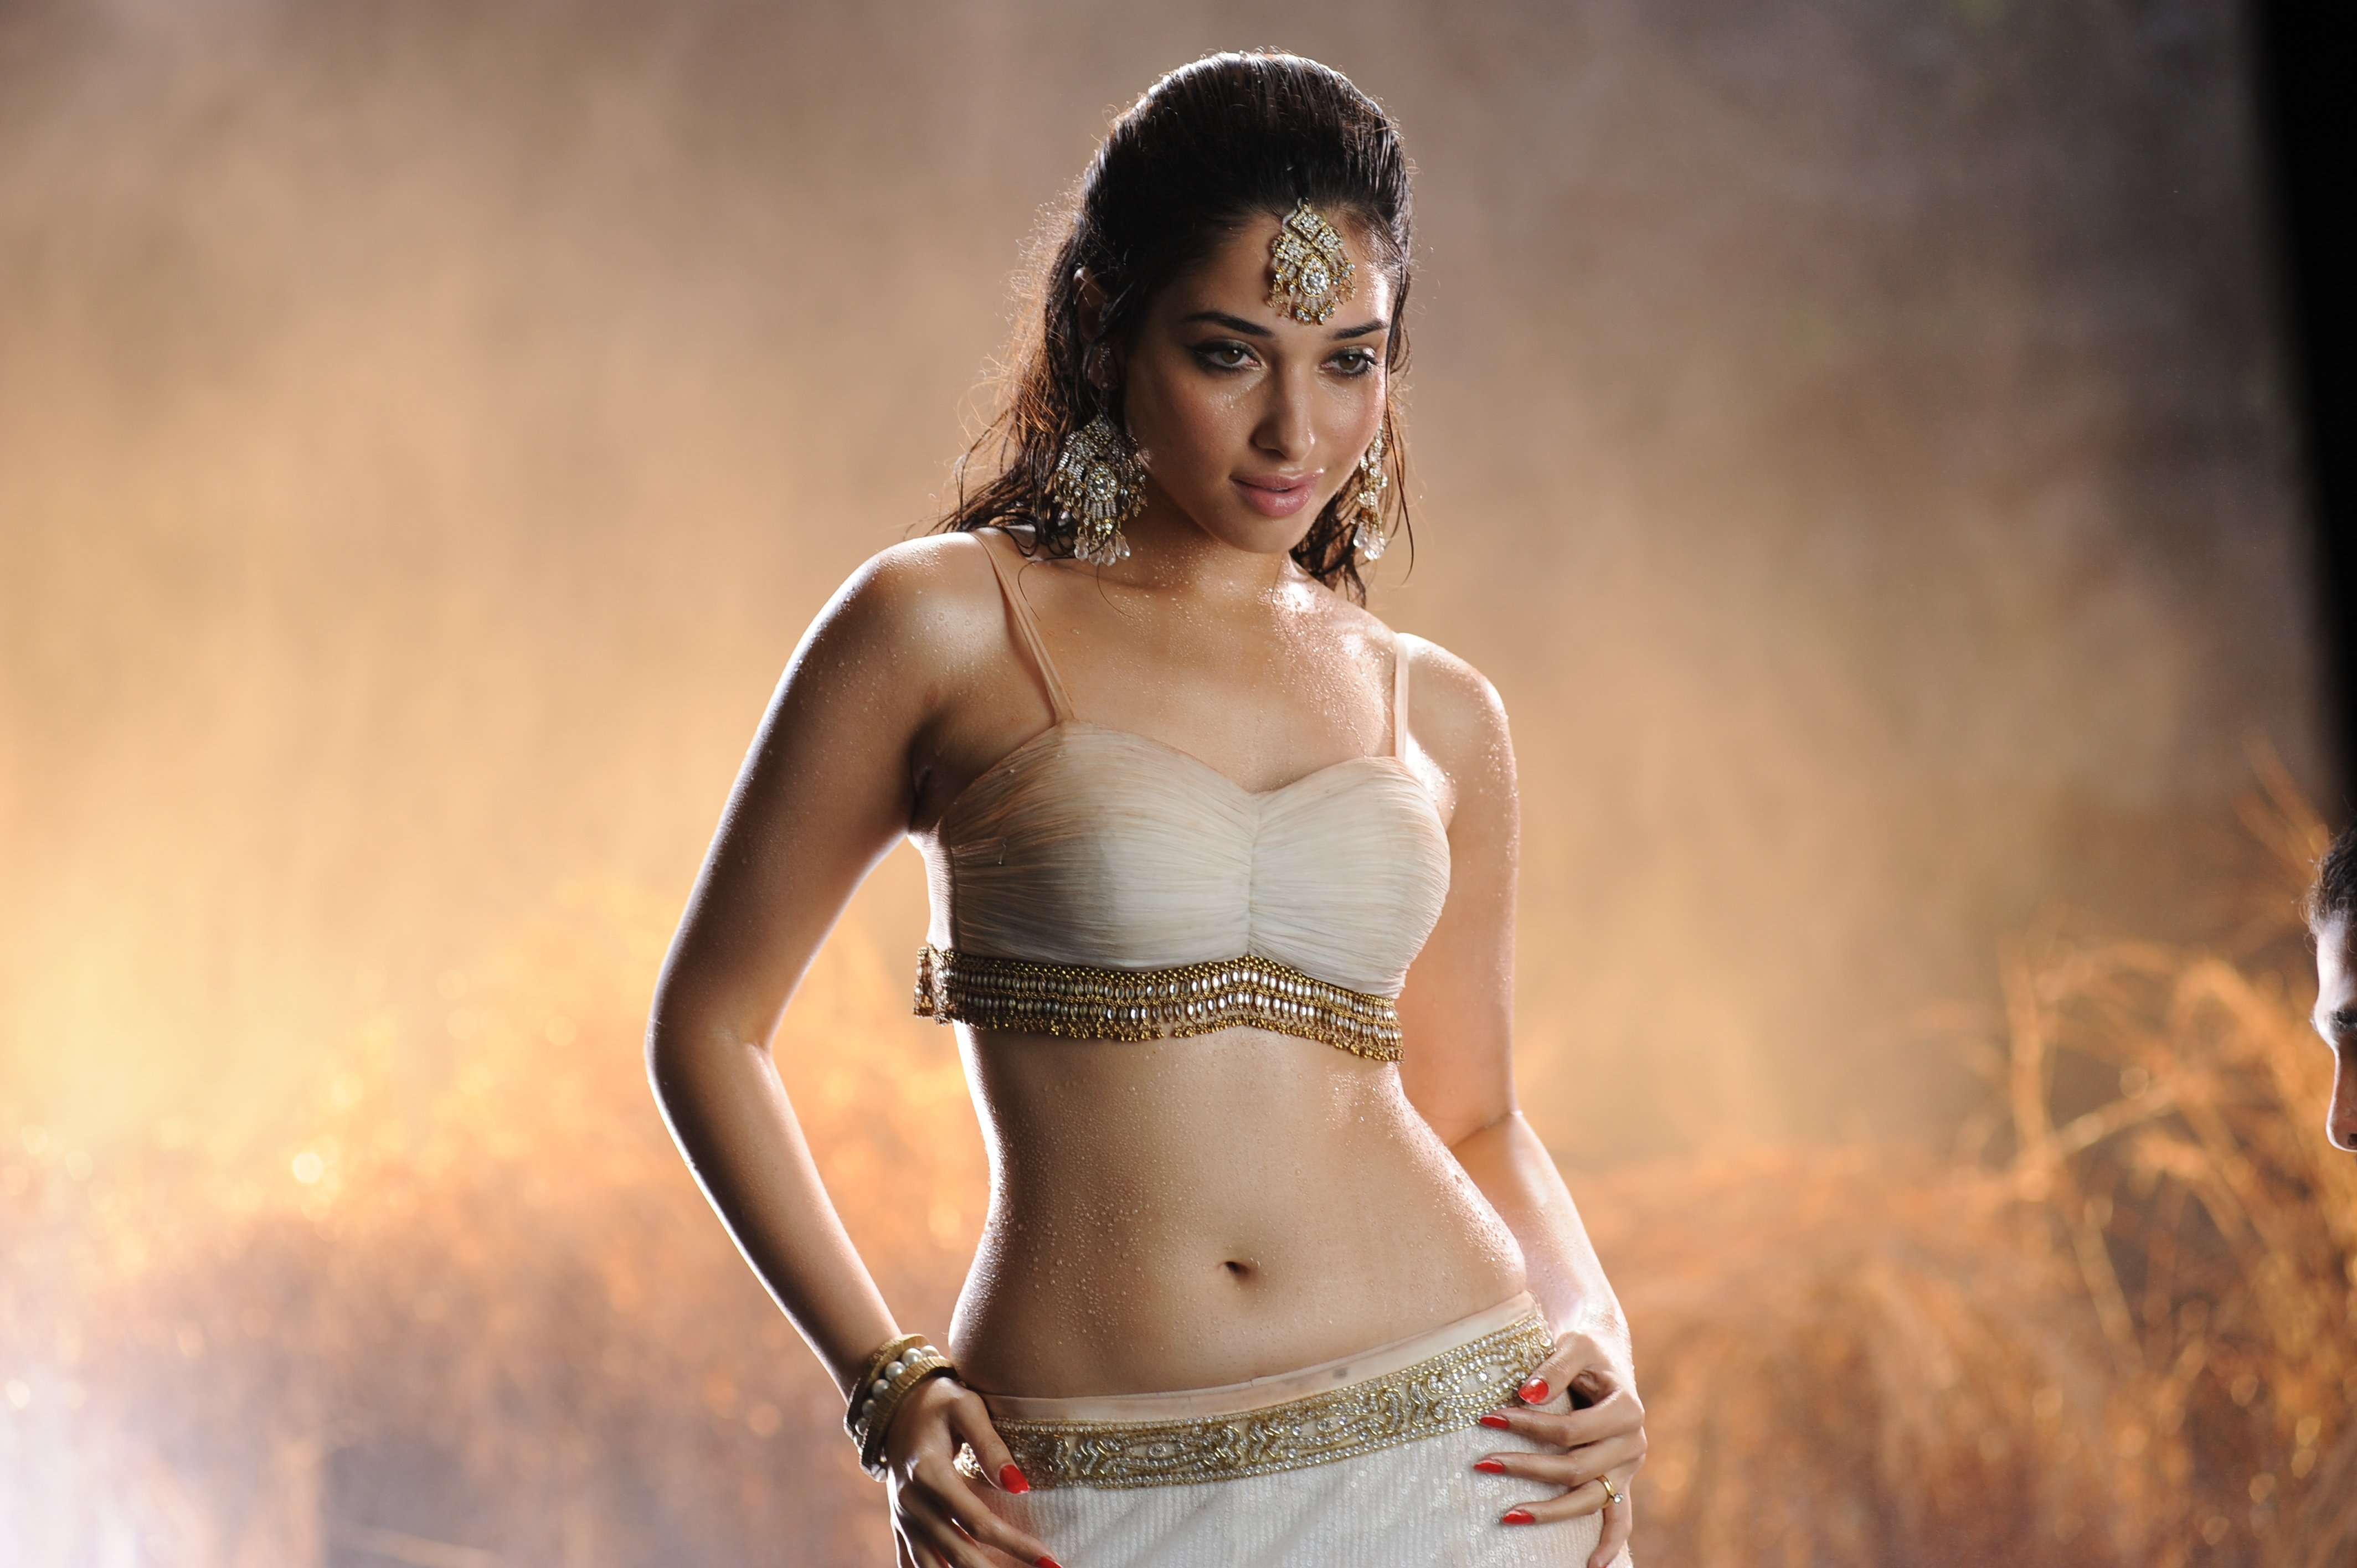 tamanna bhatia bollywood actress model babe (56) wallpaper